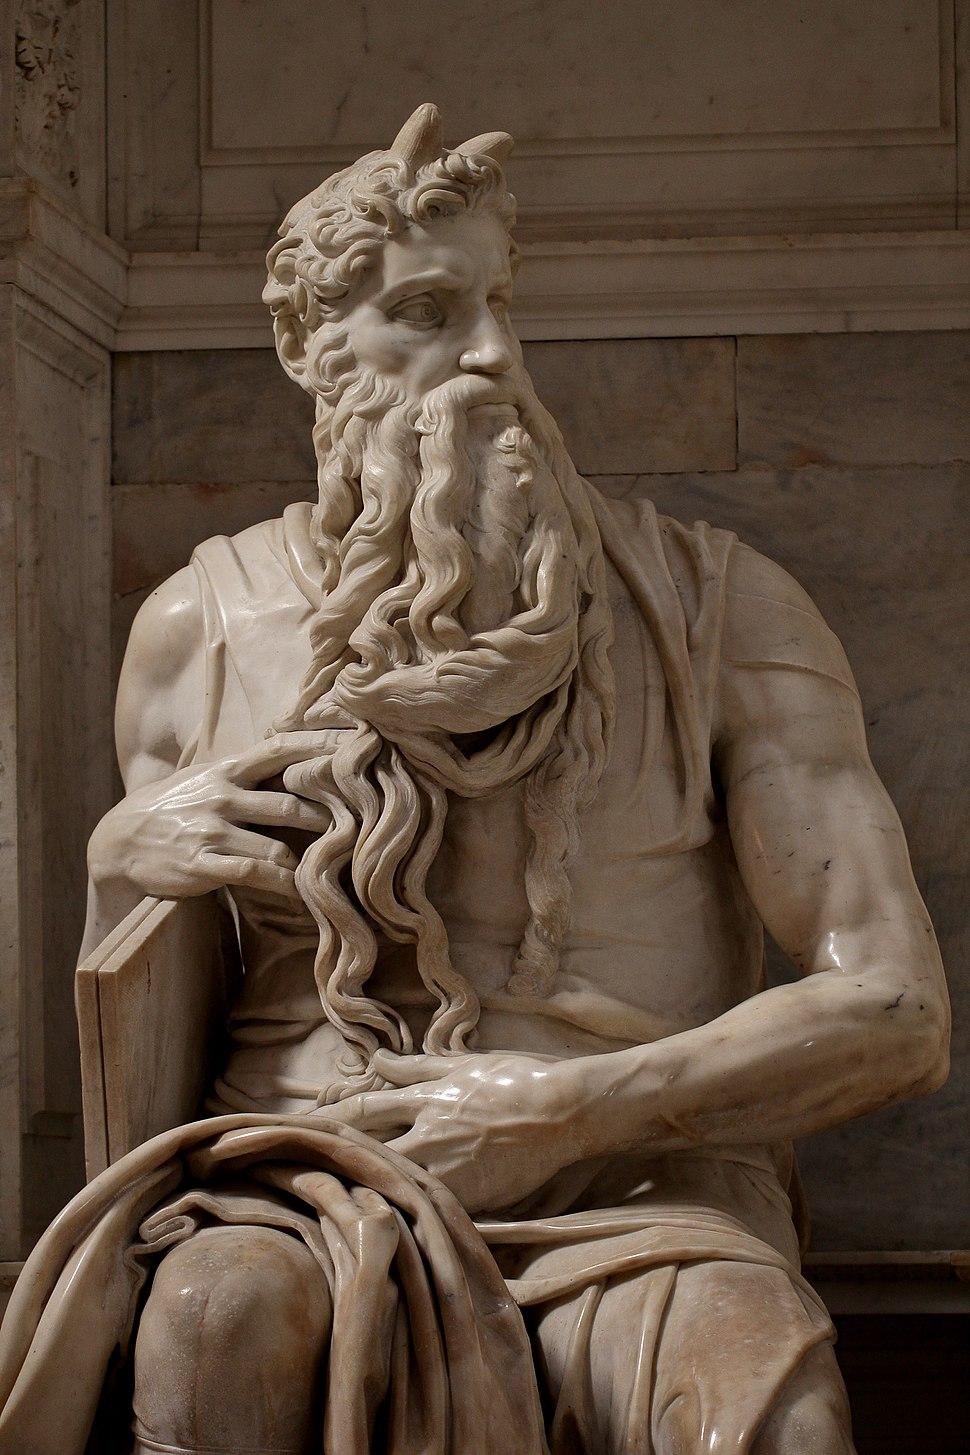 'Moses' by Michelangelo JBU190